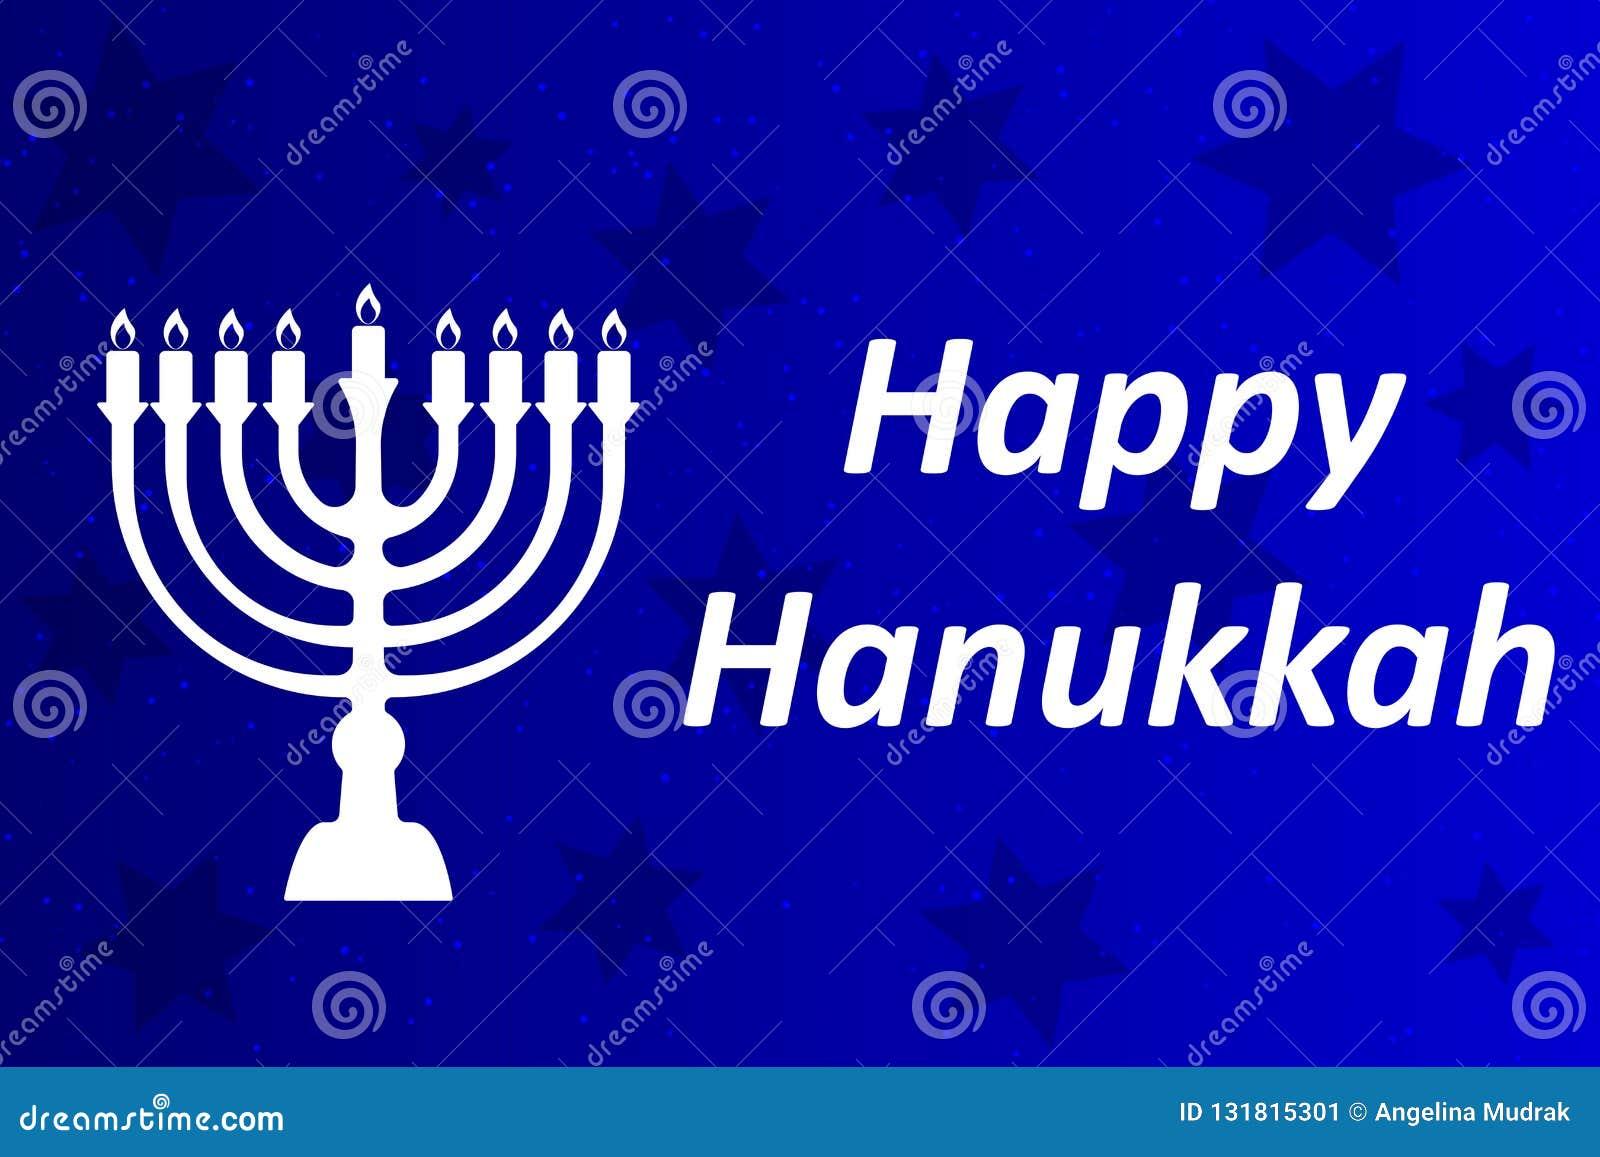 Projeto tipográfico do vetor do Hanukkah - Hanukkah feliz A